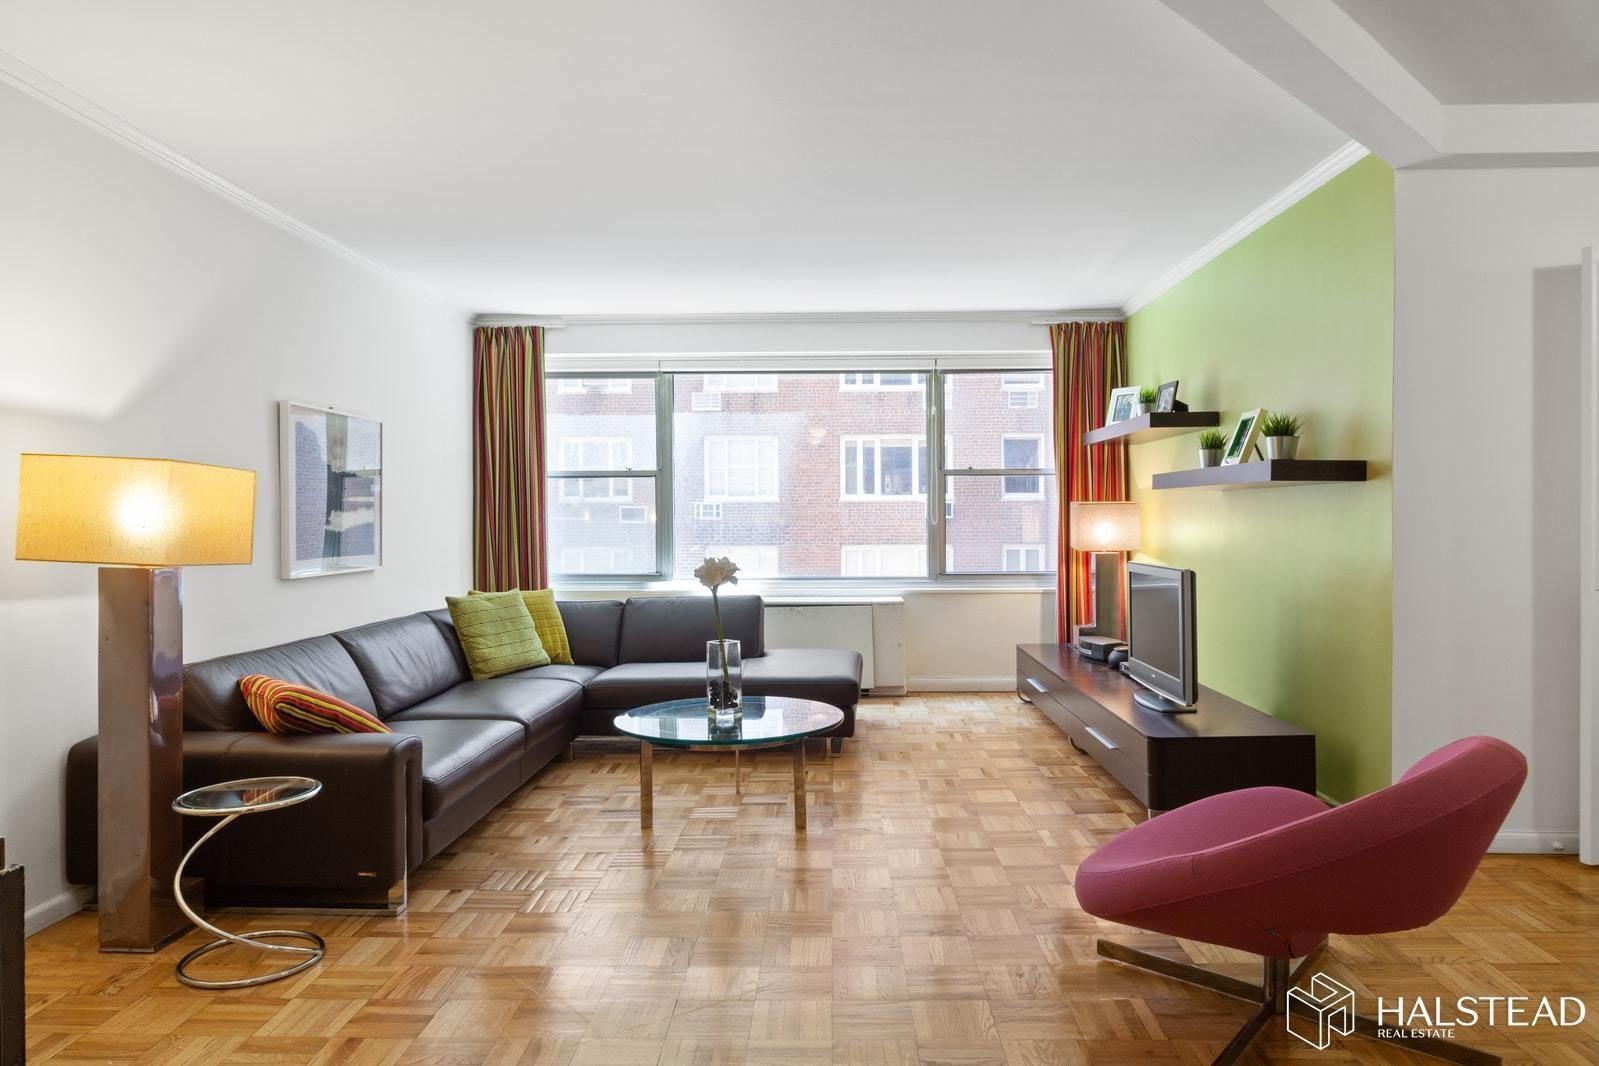 Apartment for sale at 75 East End Avenue, Apt 3D